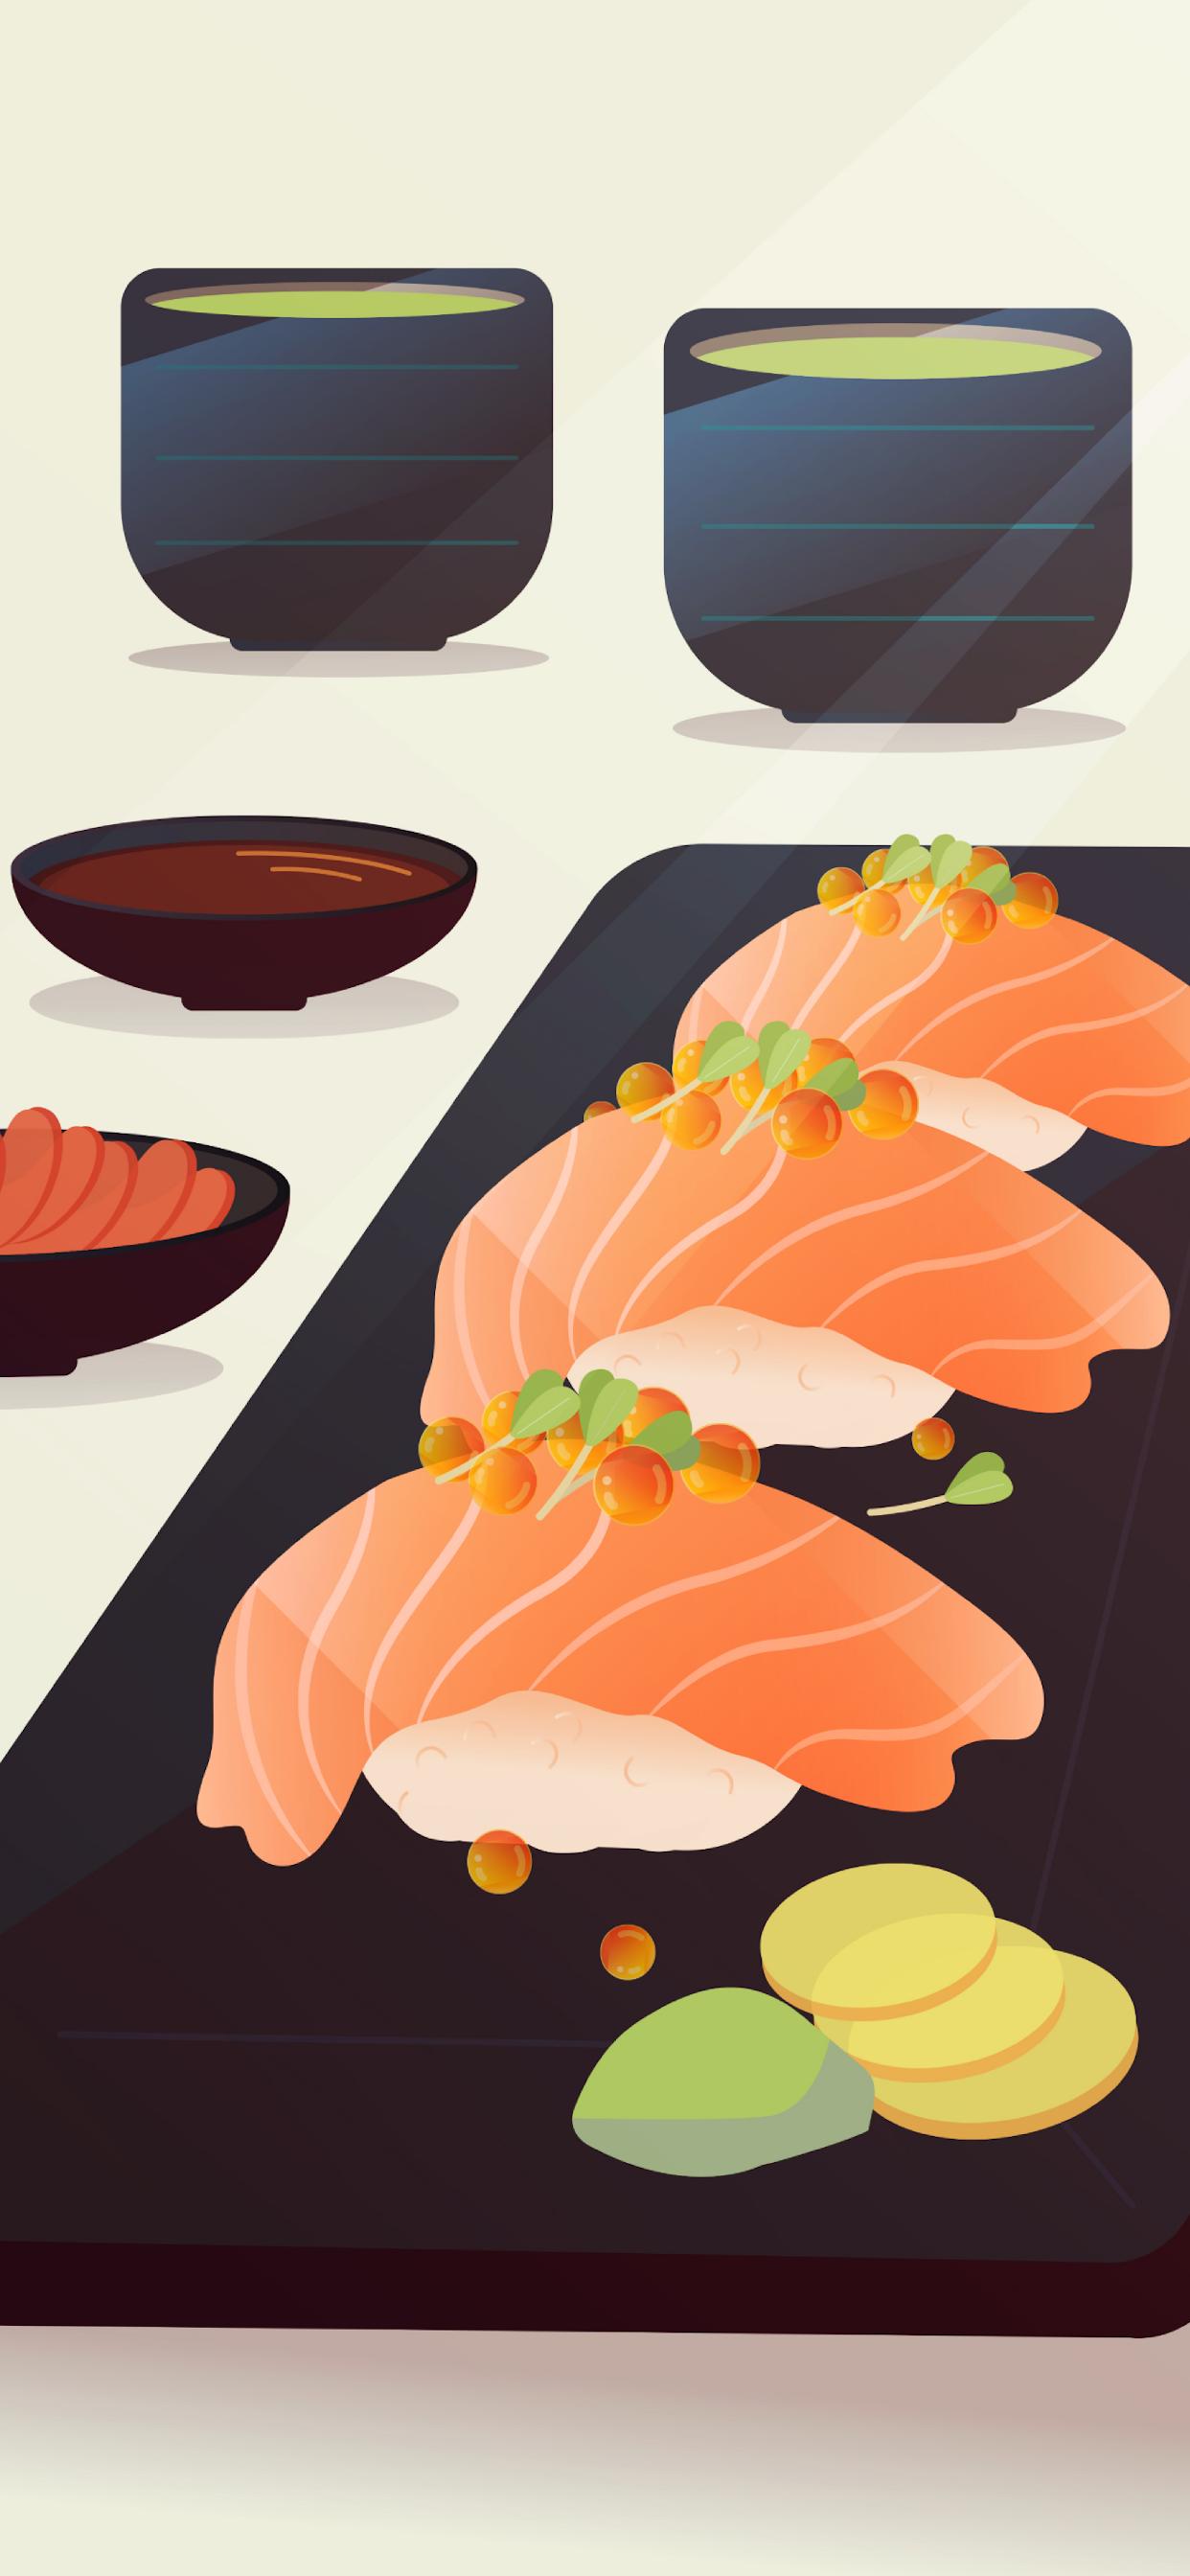 iPhone wallpapers illustration sushi tea Fonds d'écran iPhone du 21/10/2019